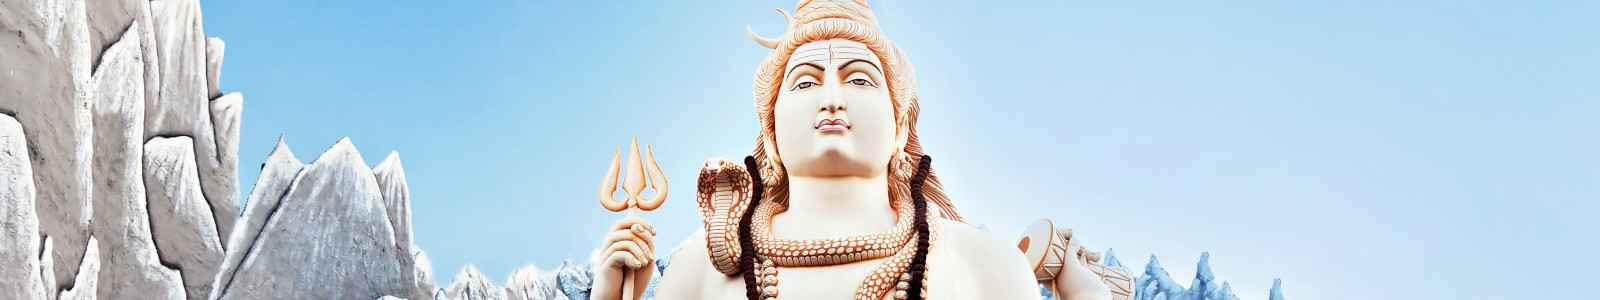 2088-shiva-yoga-statue-blue-skye-1600x300.jpg